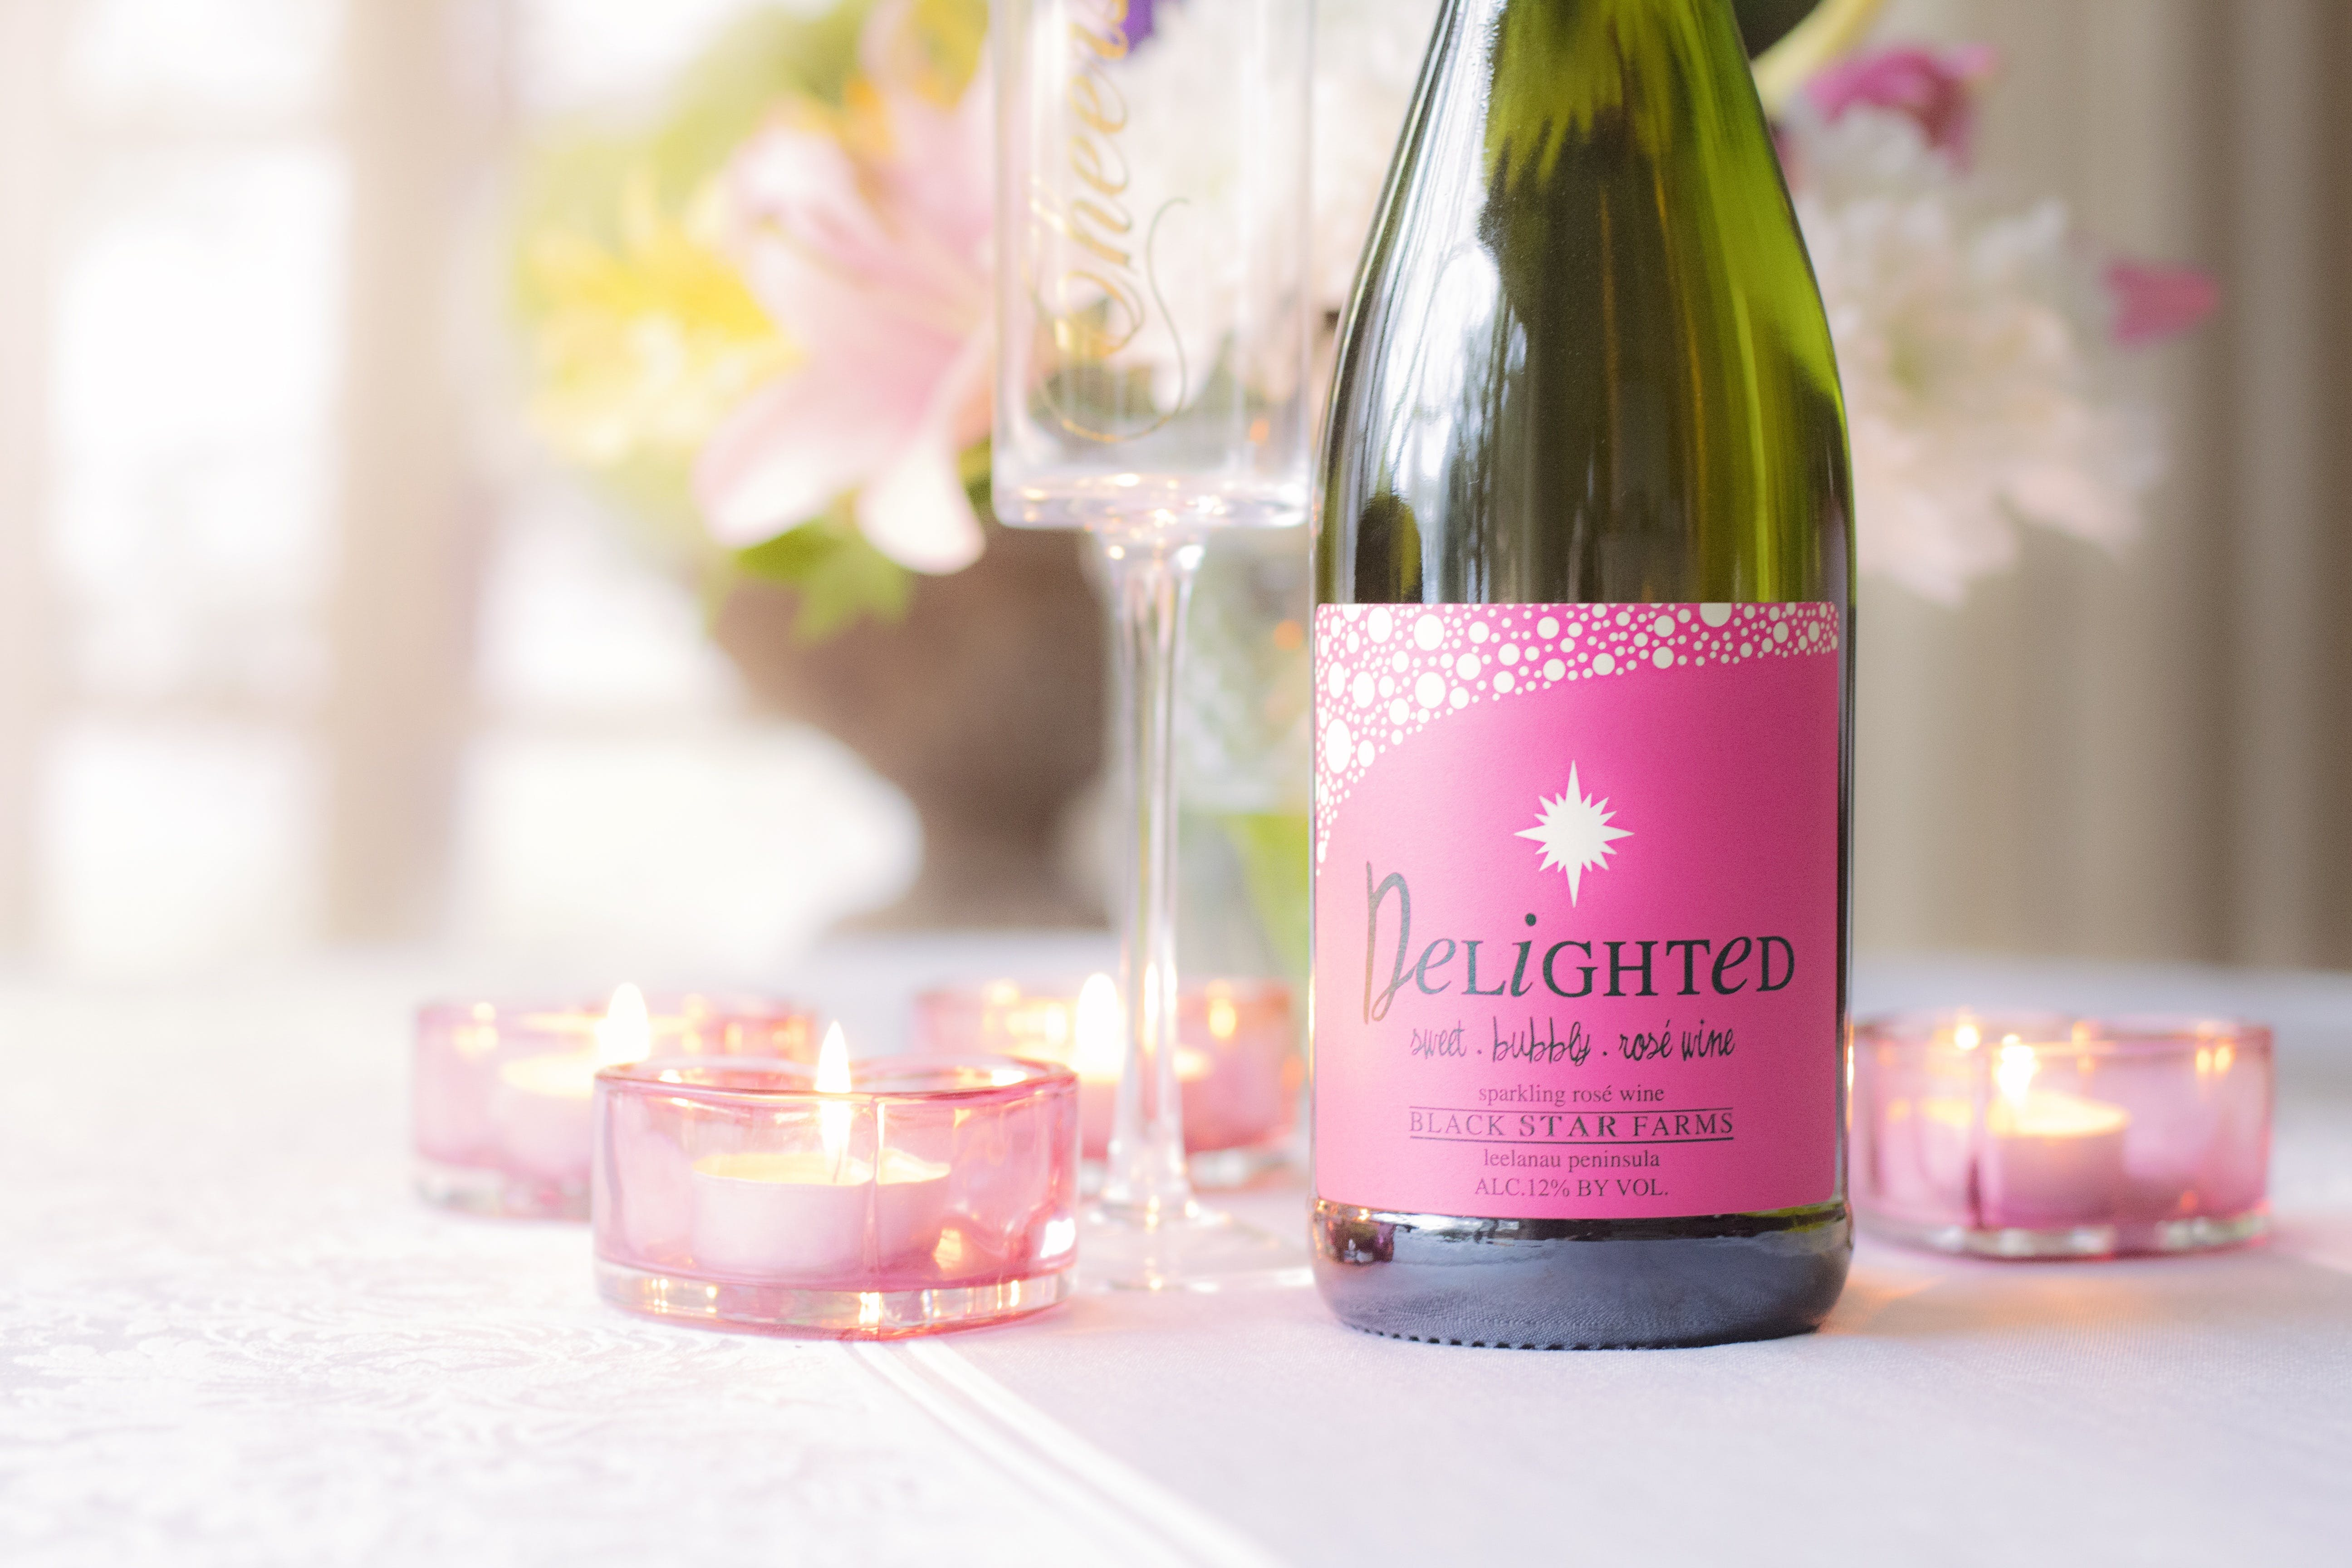 Delighted Wine Bottle